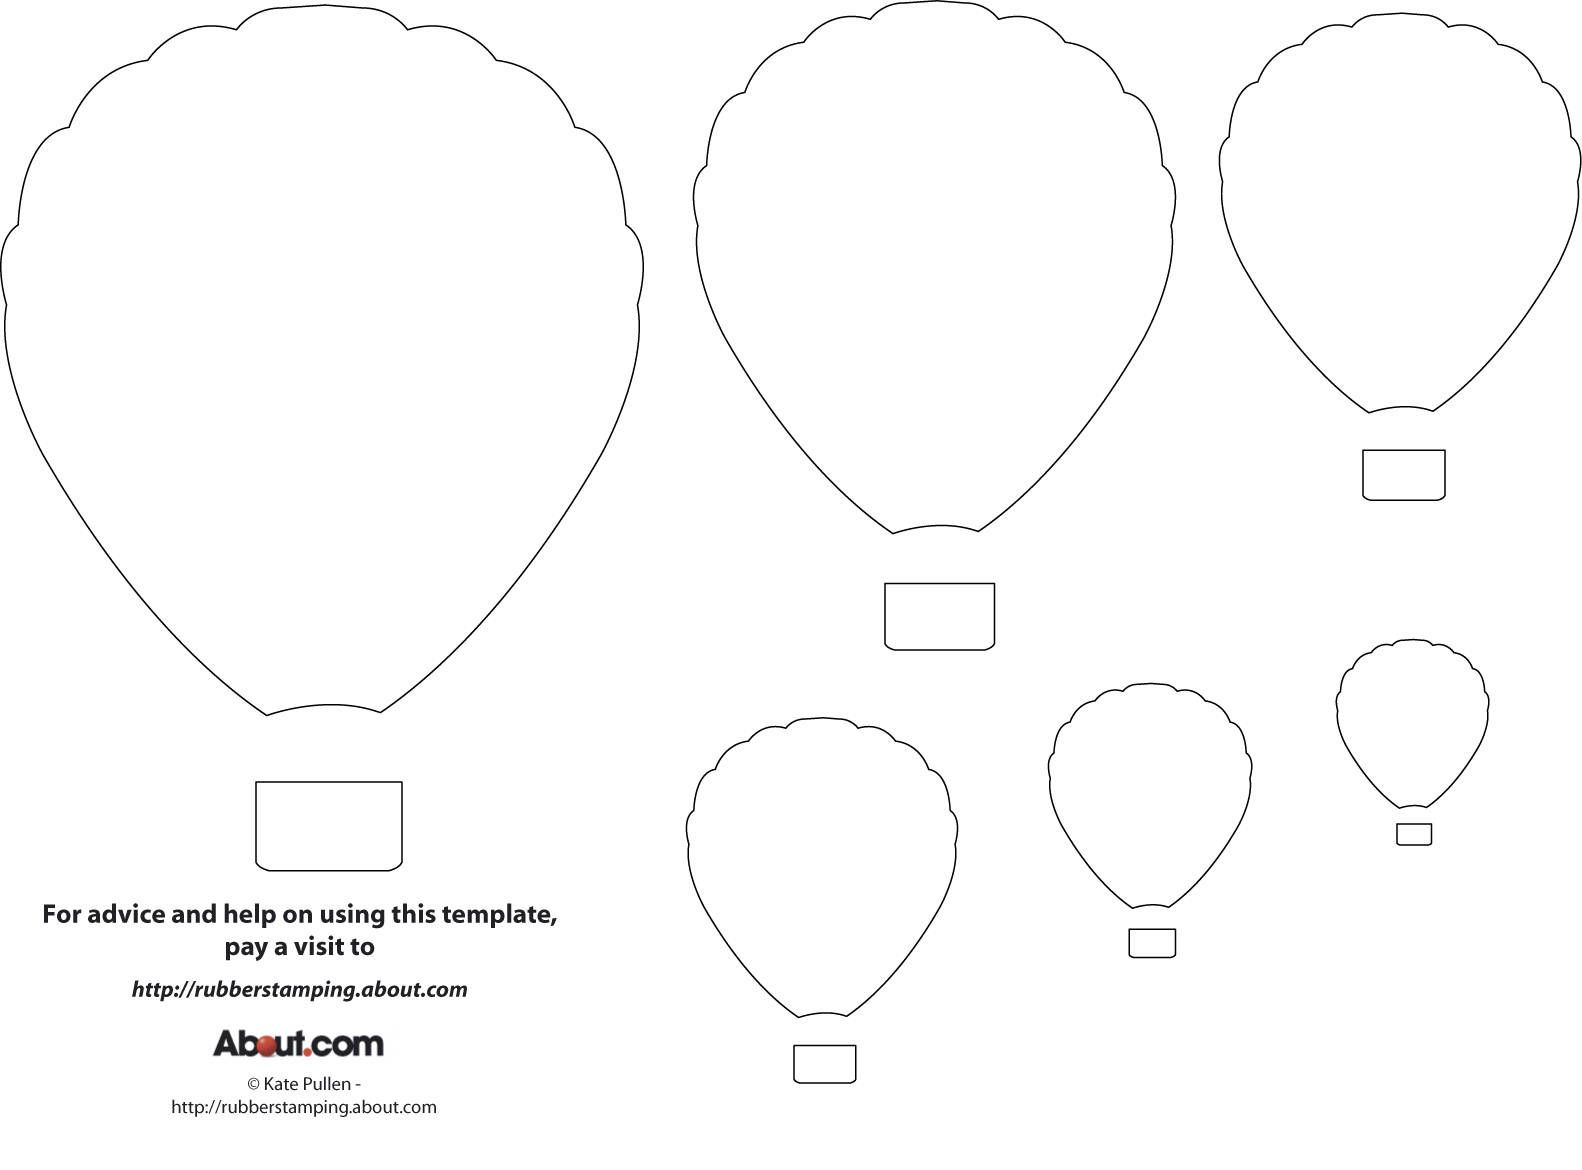 12 Free Printable Templates   Printables   Pinterest   Balloon - Free Printable Pictures Of Balloons